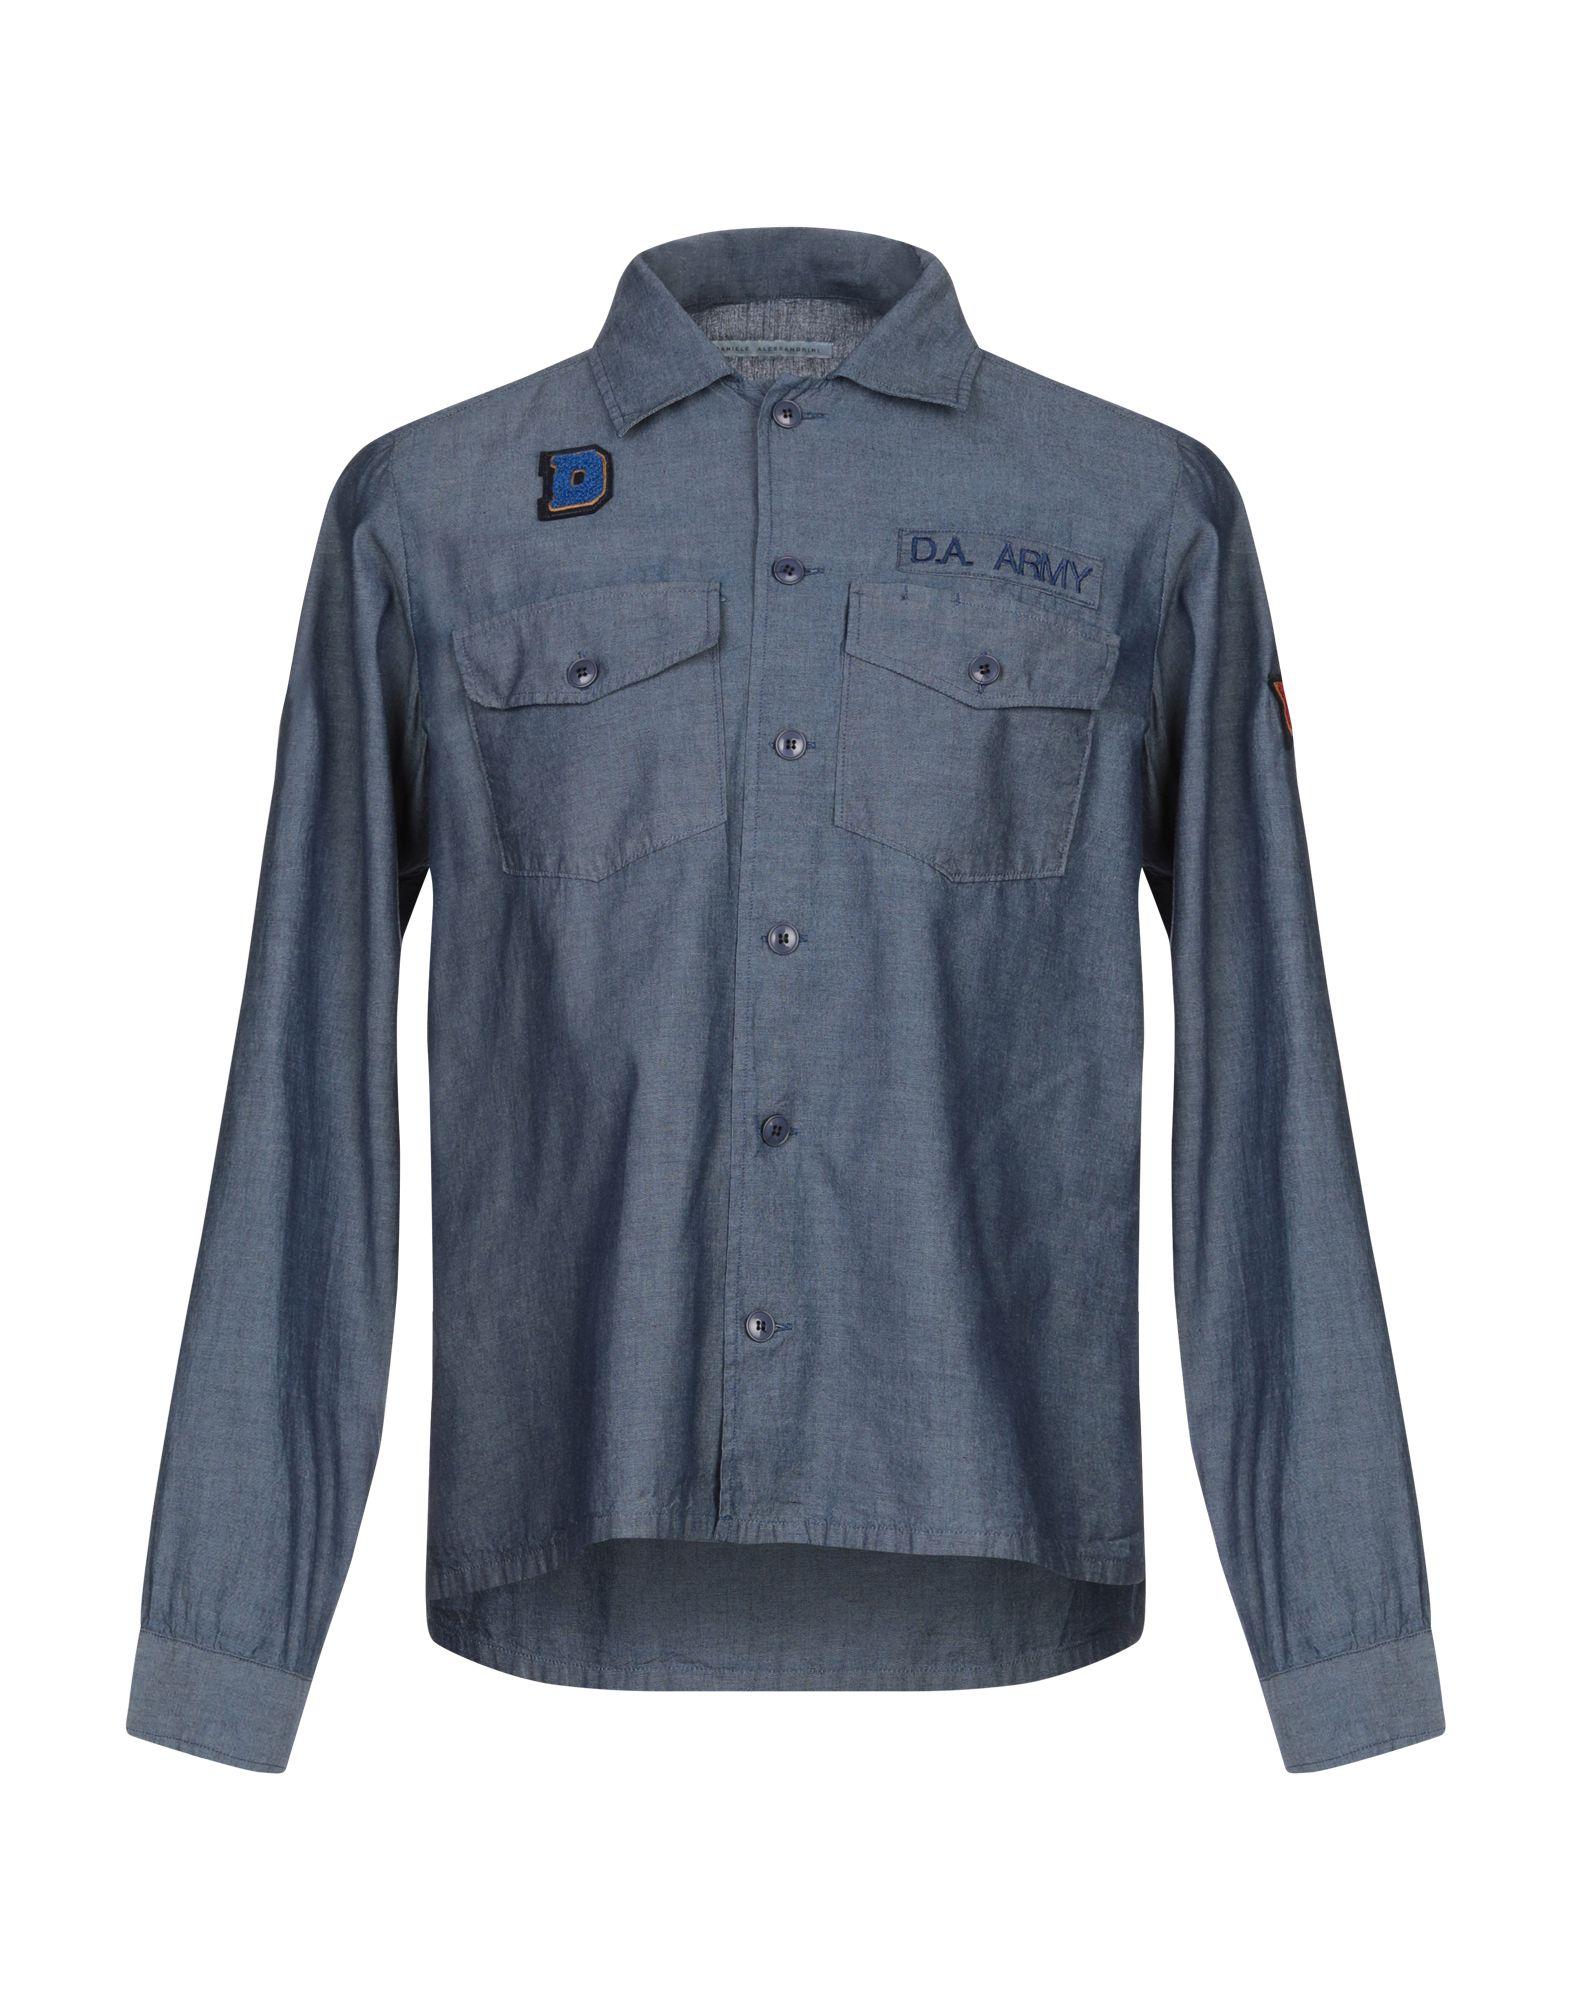 DANIELE ALESSANDRINI Джинсовая рубашка daniele alessandrini homme джинсовая рубашка